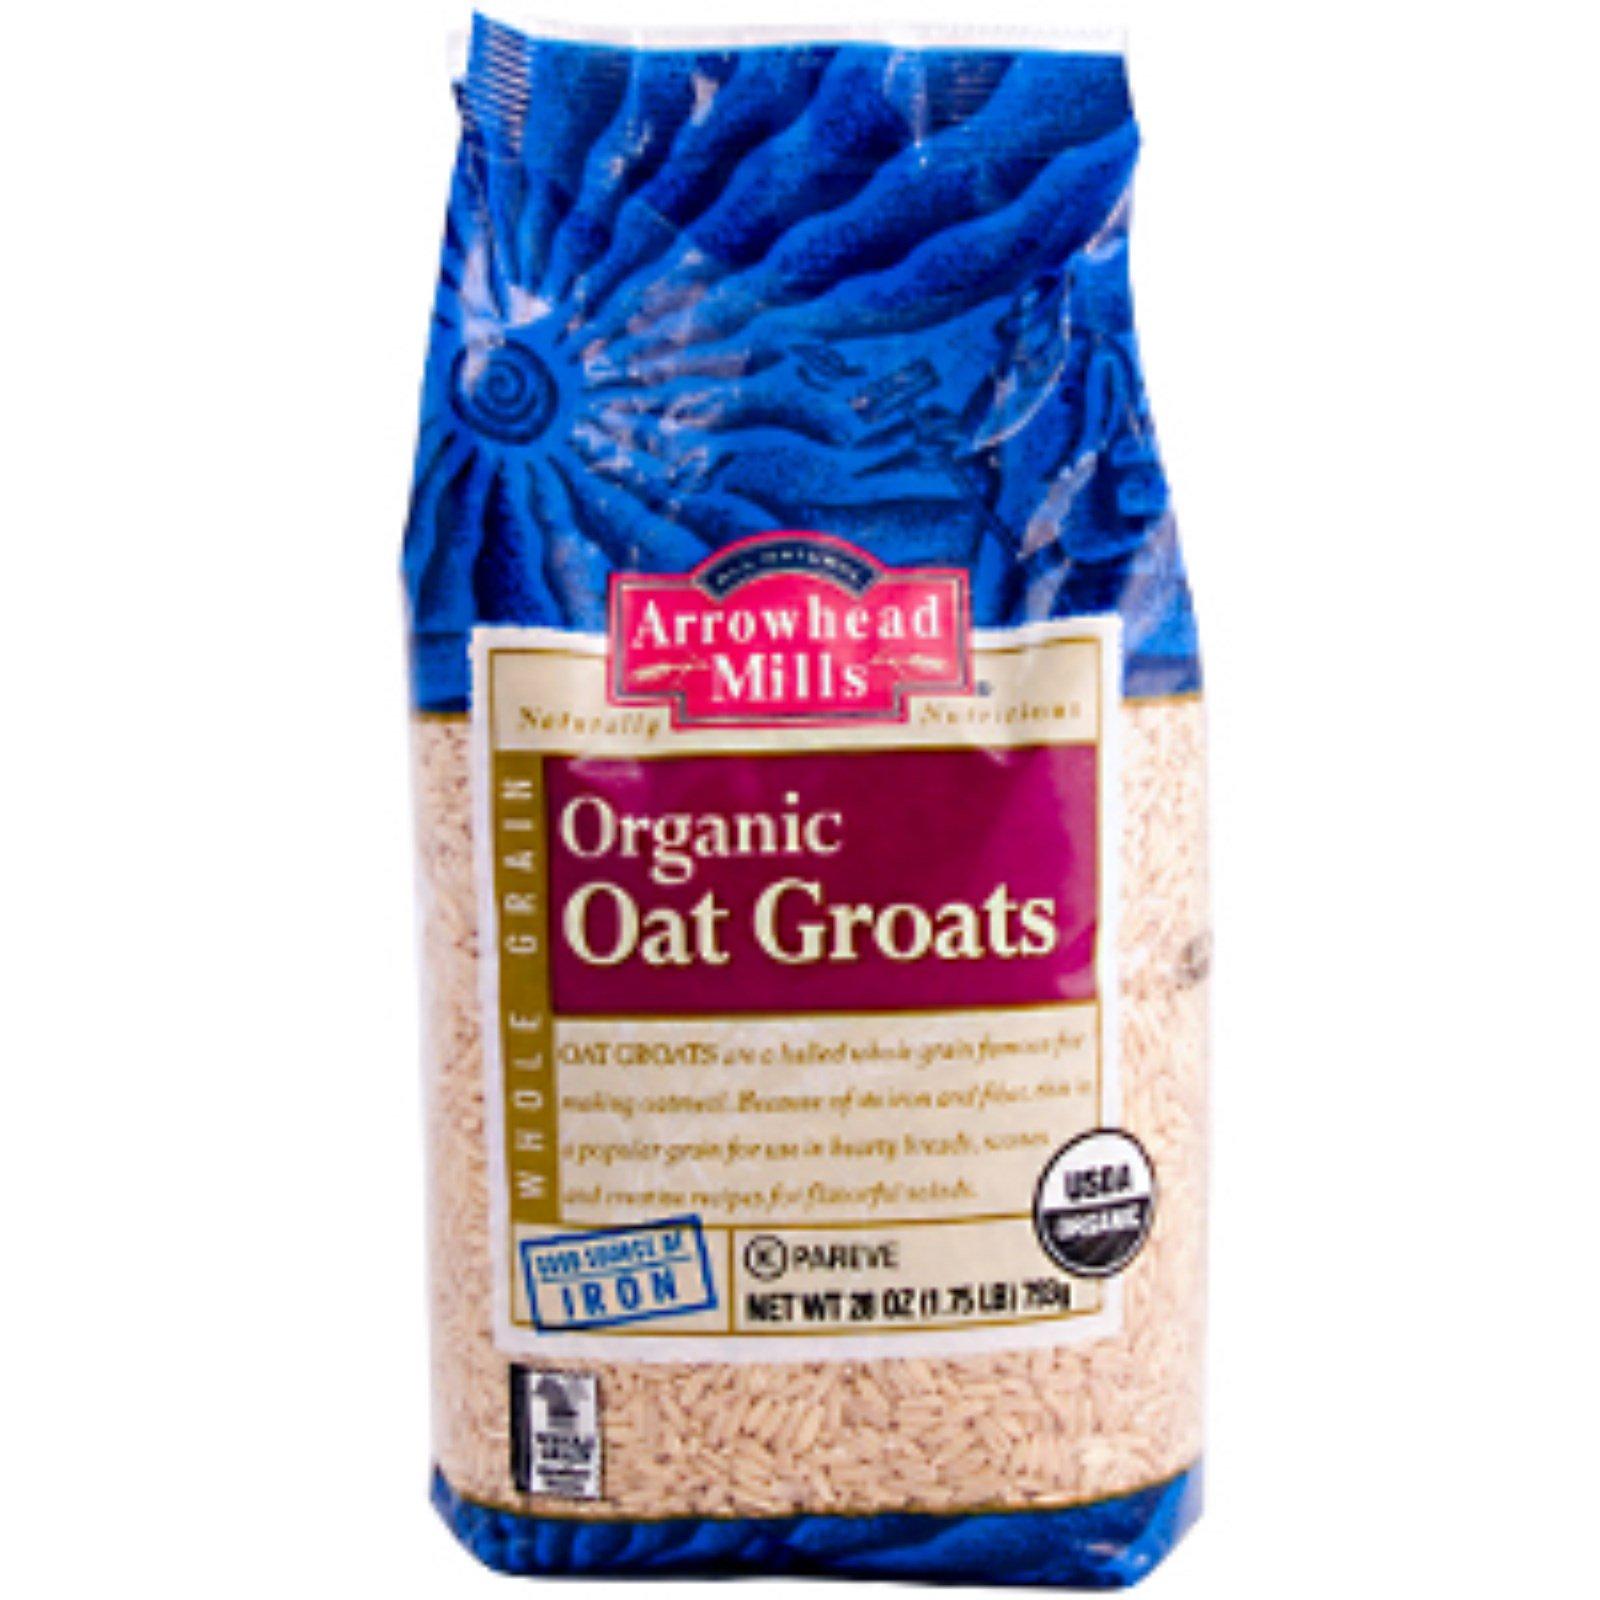 Arrowhead Mills, Whole Grain Organic Oat Groats, 28 oz (793 g